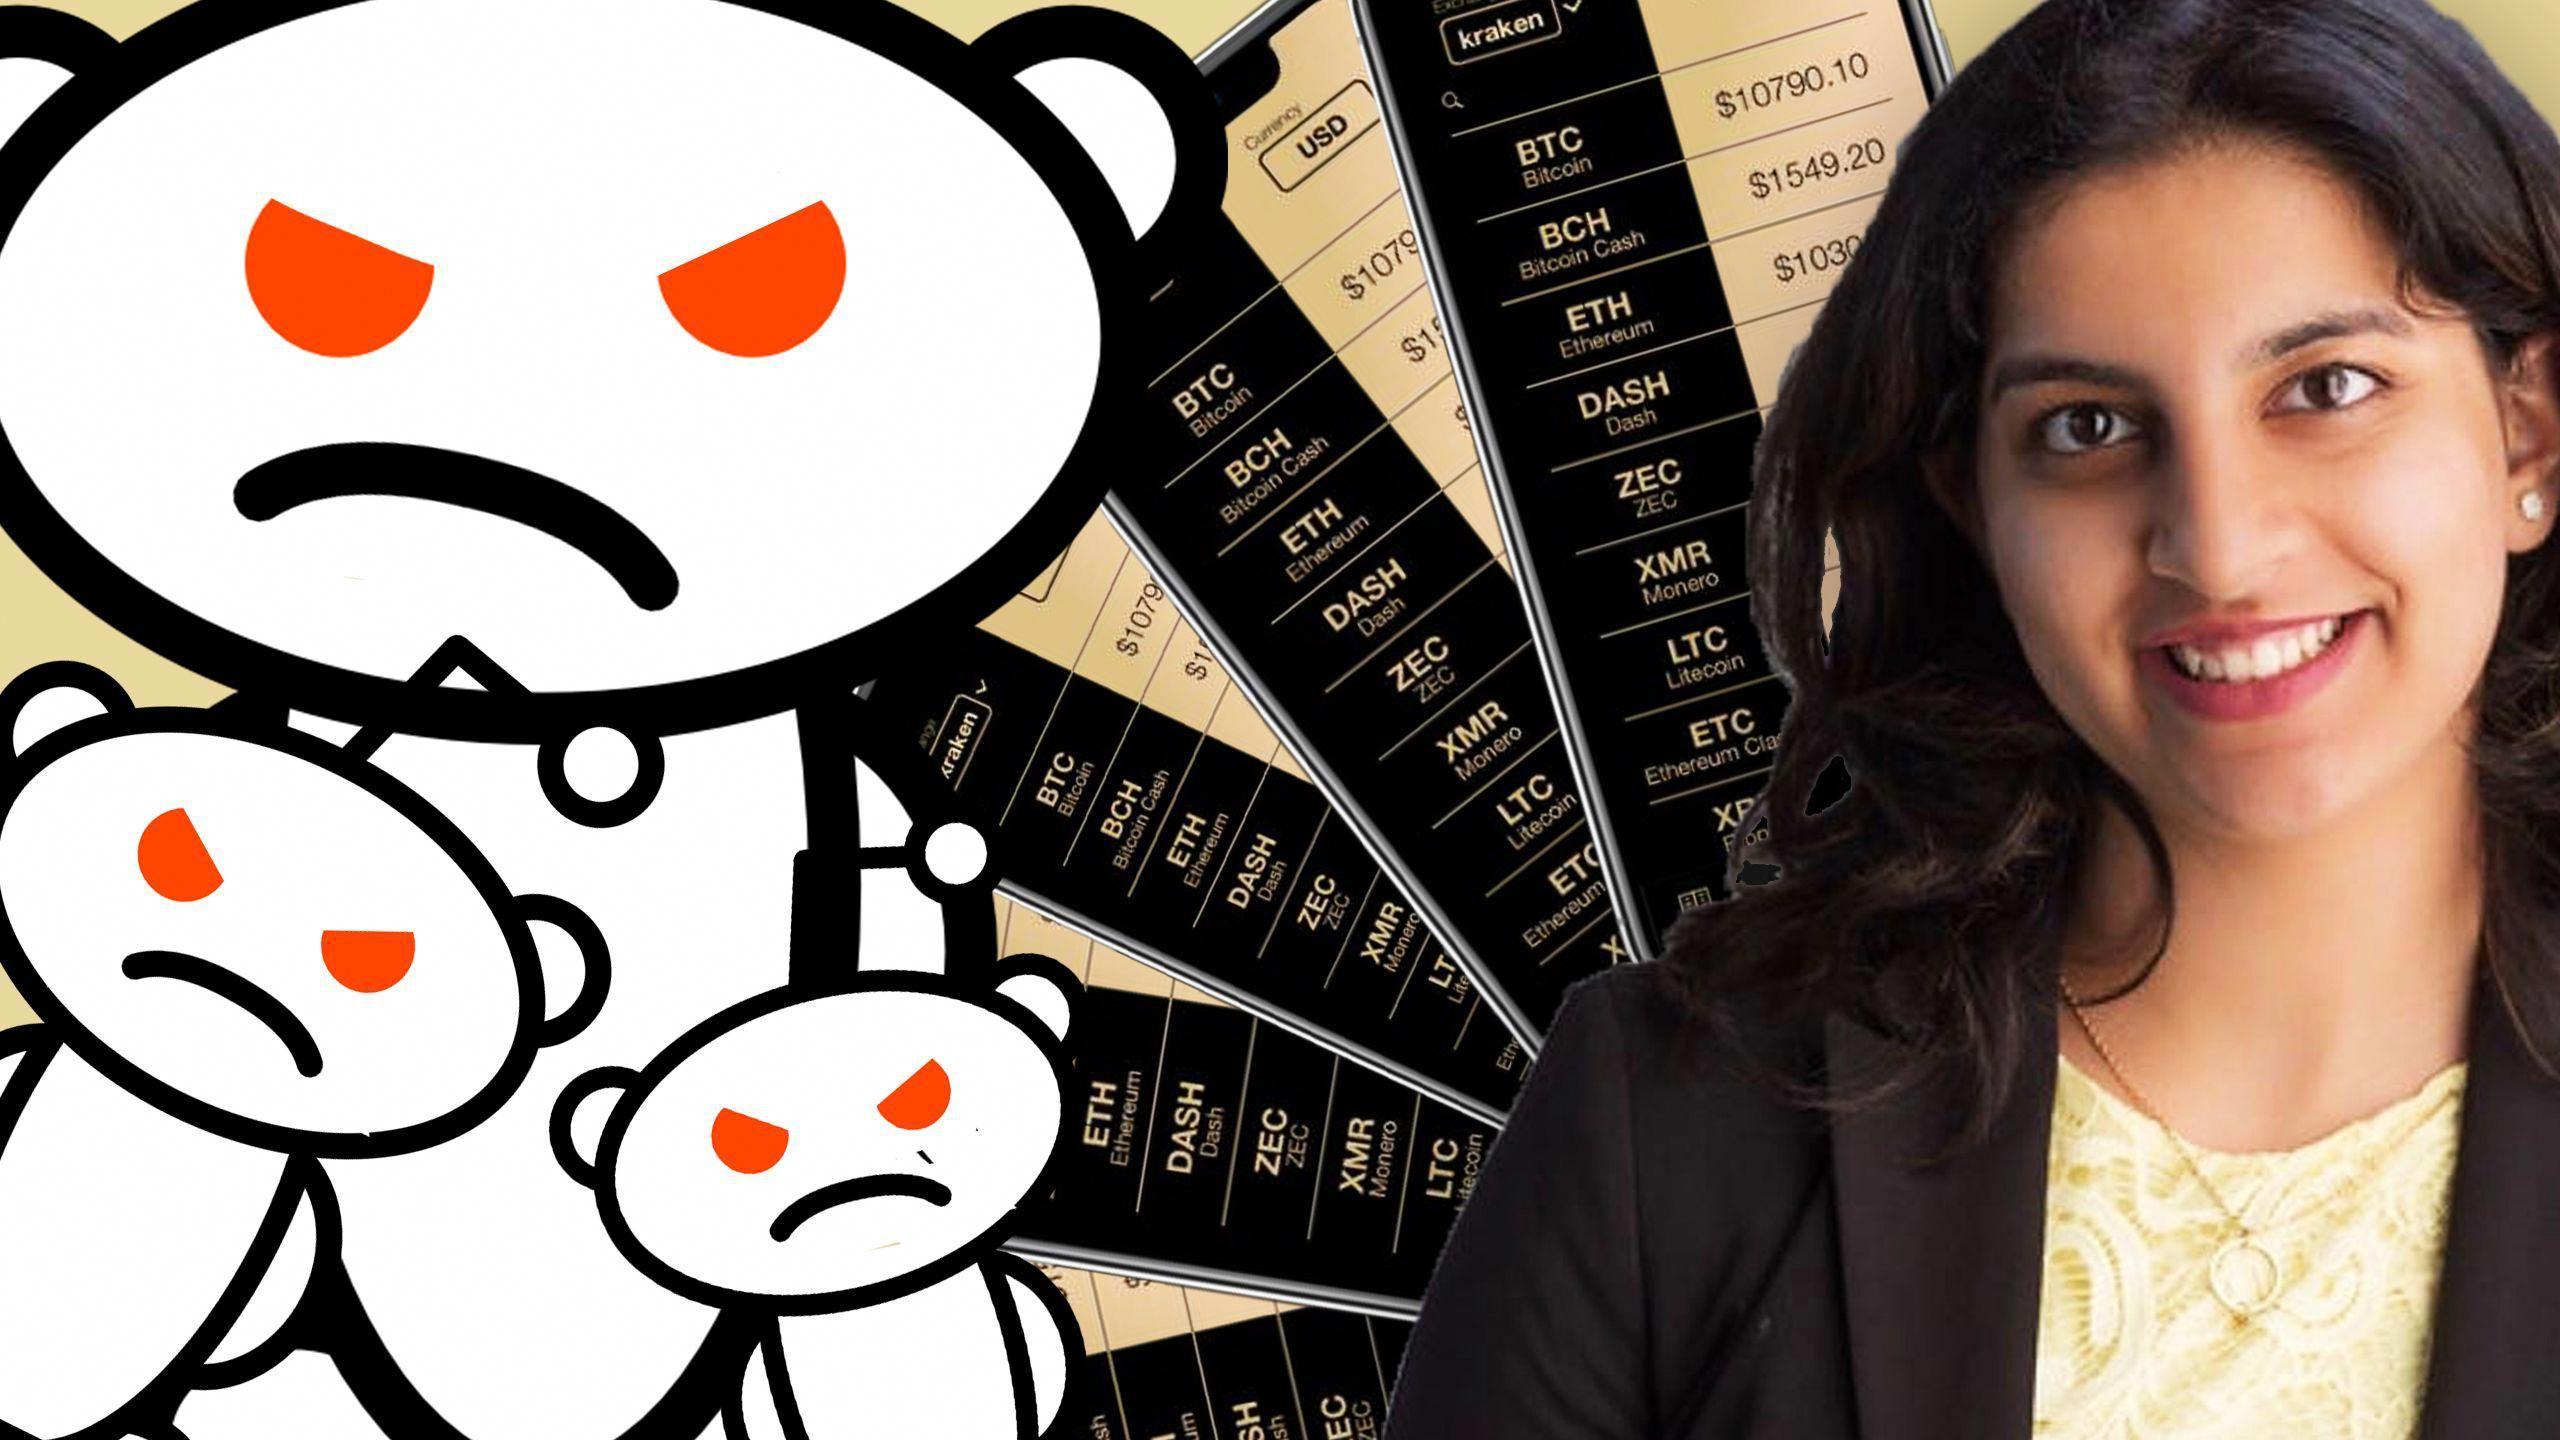 A Reddit mob came after 16yearold Harshita Arora